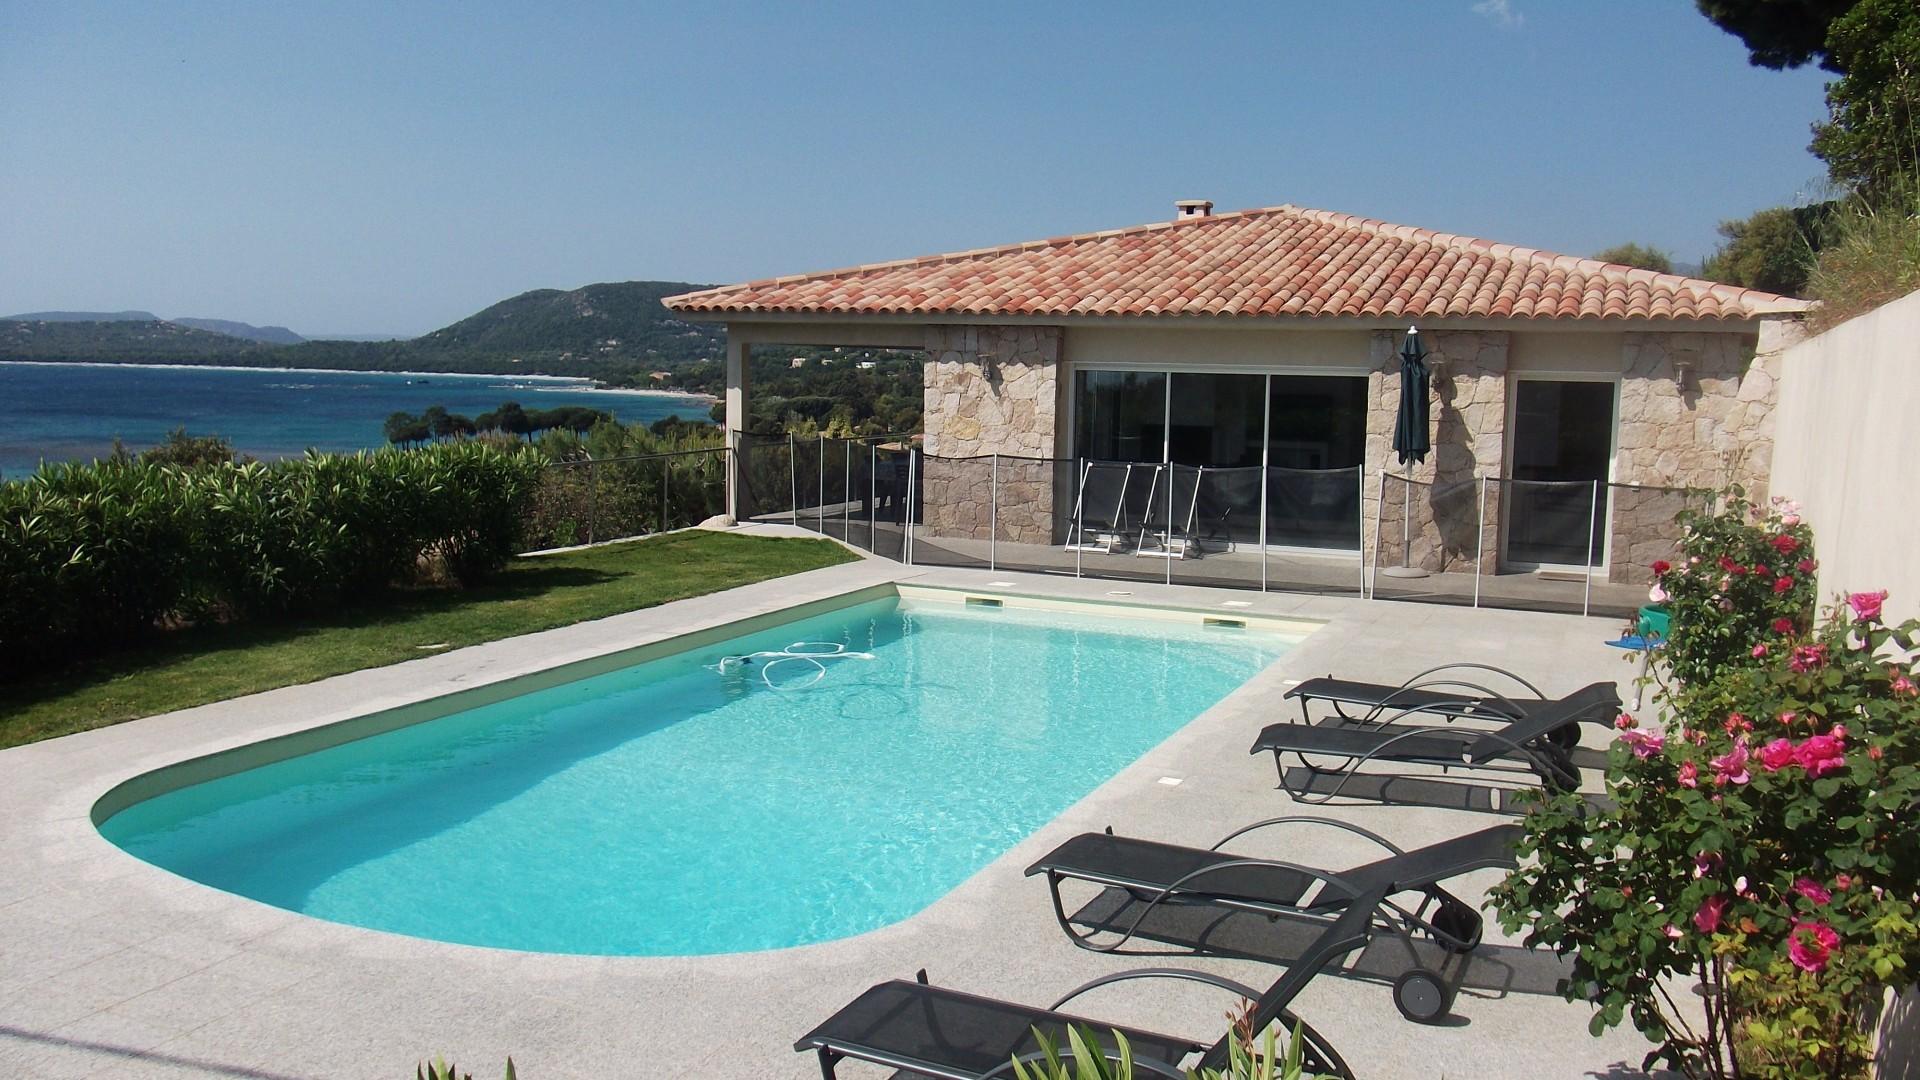 Ferienhaus Süd Korsika,Pool